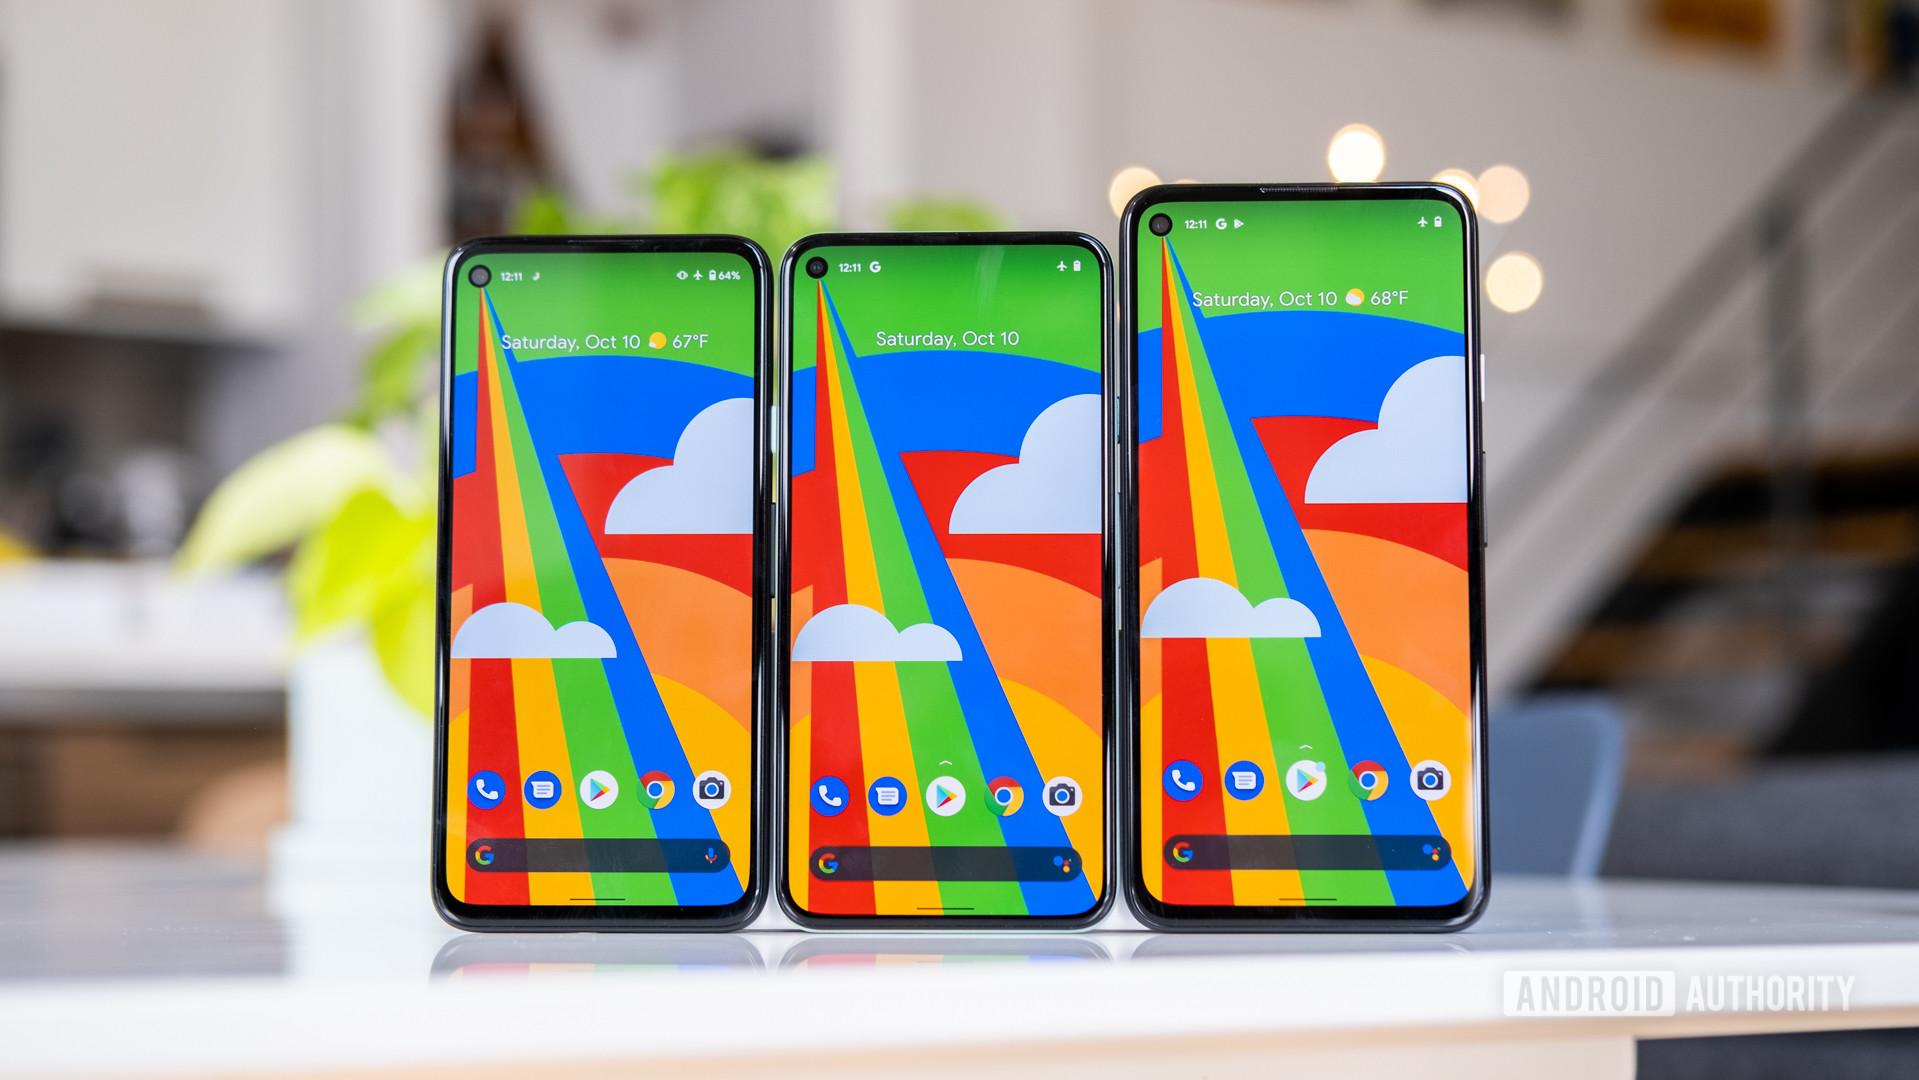 Google Pixel 5 next to Pixel 4a and Pixel 4a 5G 2